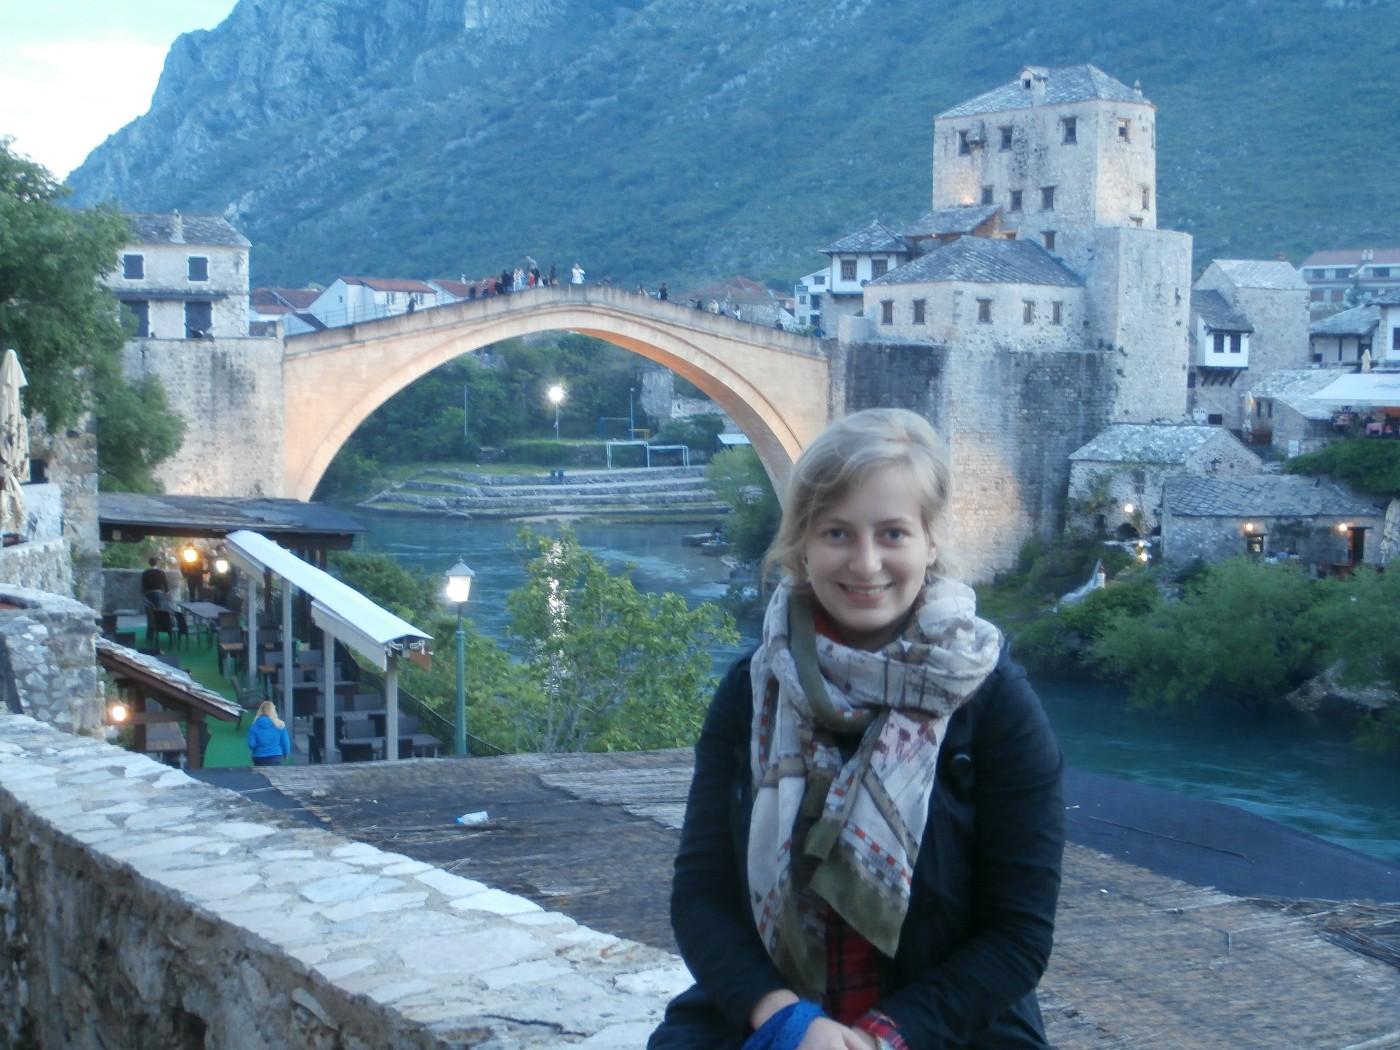 Stari Most Mostar Bosnia and Herzegovina mandatory photo with the old bridge